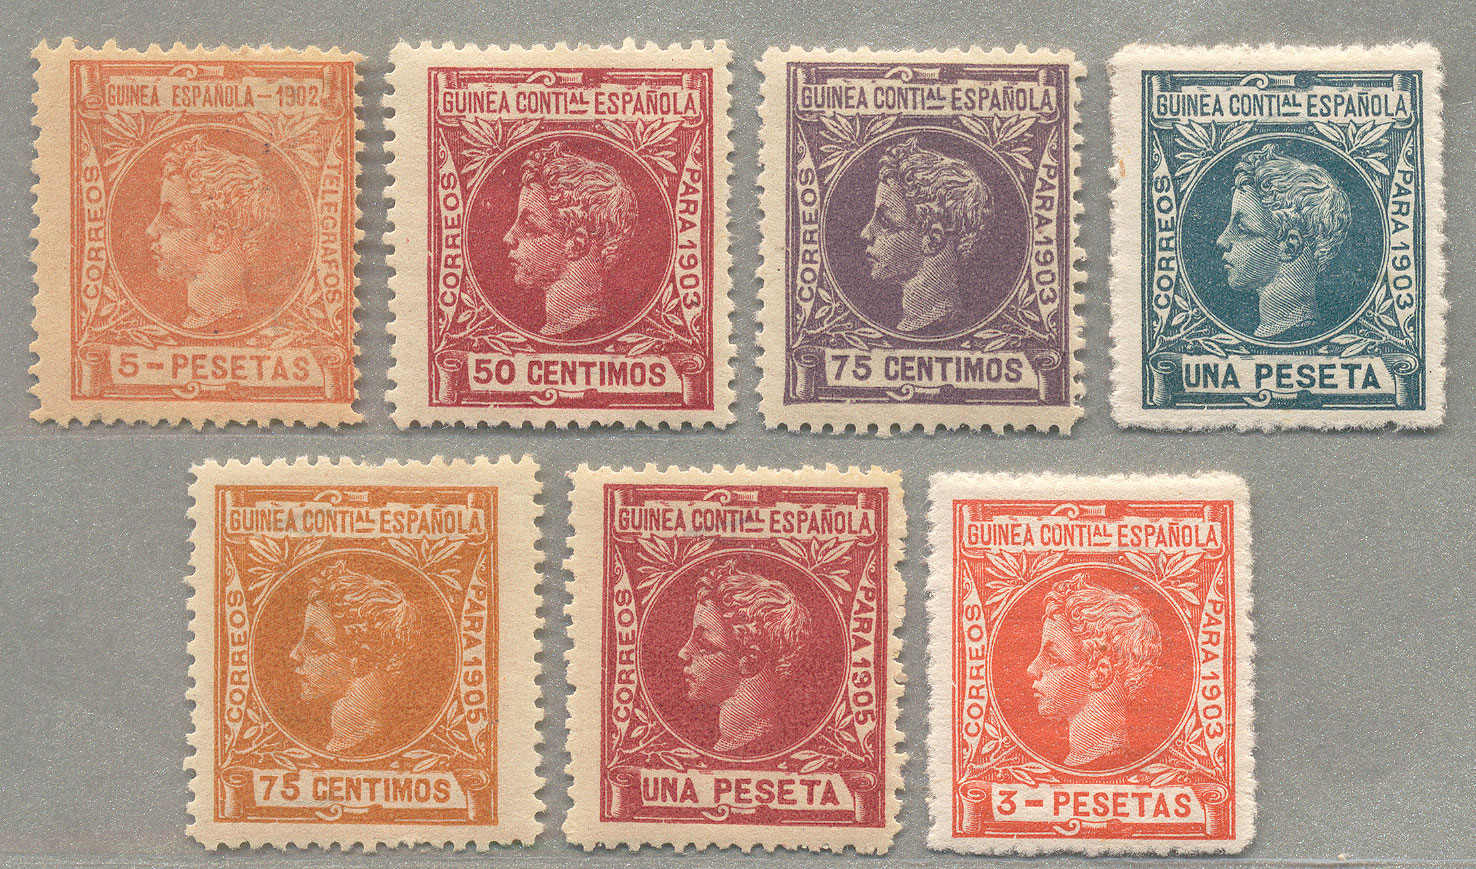 Lot 11097 - andere gebiete spanisch guinea -  classicphil GmbH 7'th classicphil Auction - Day 1